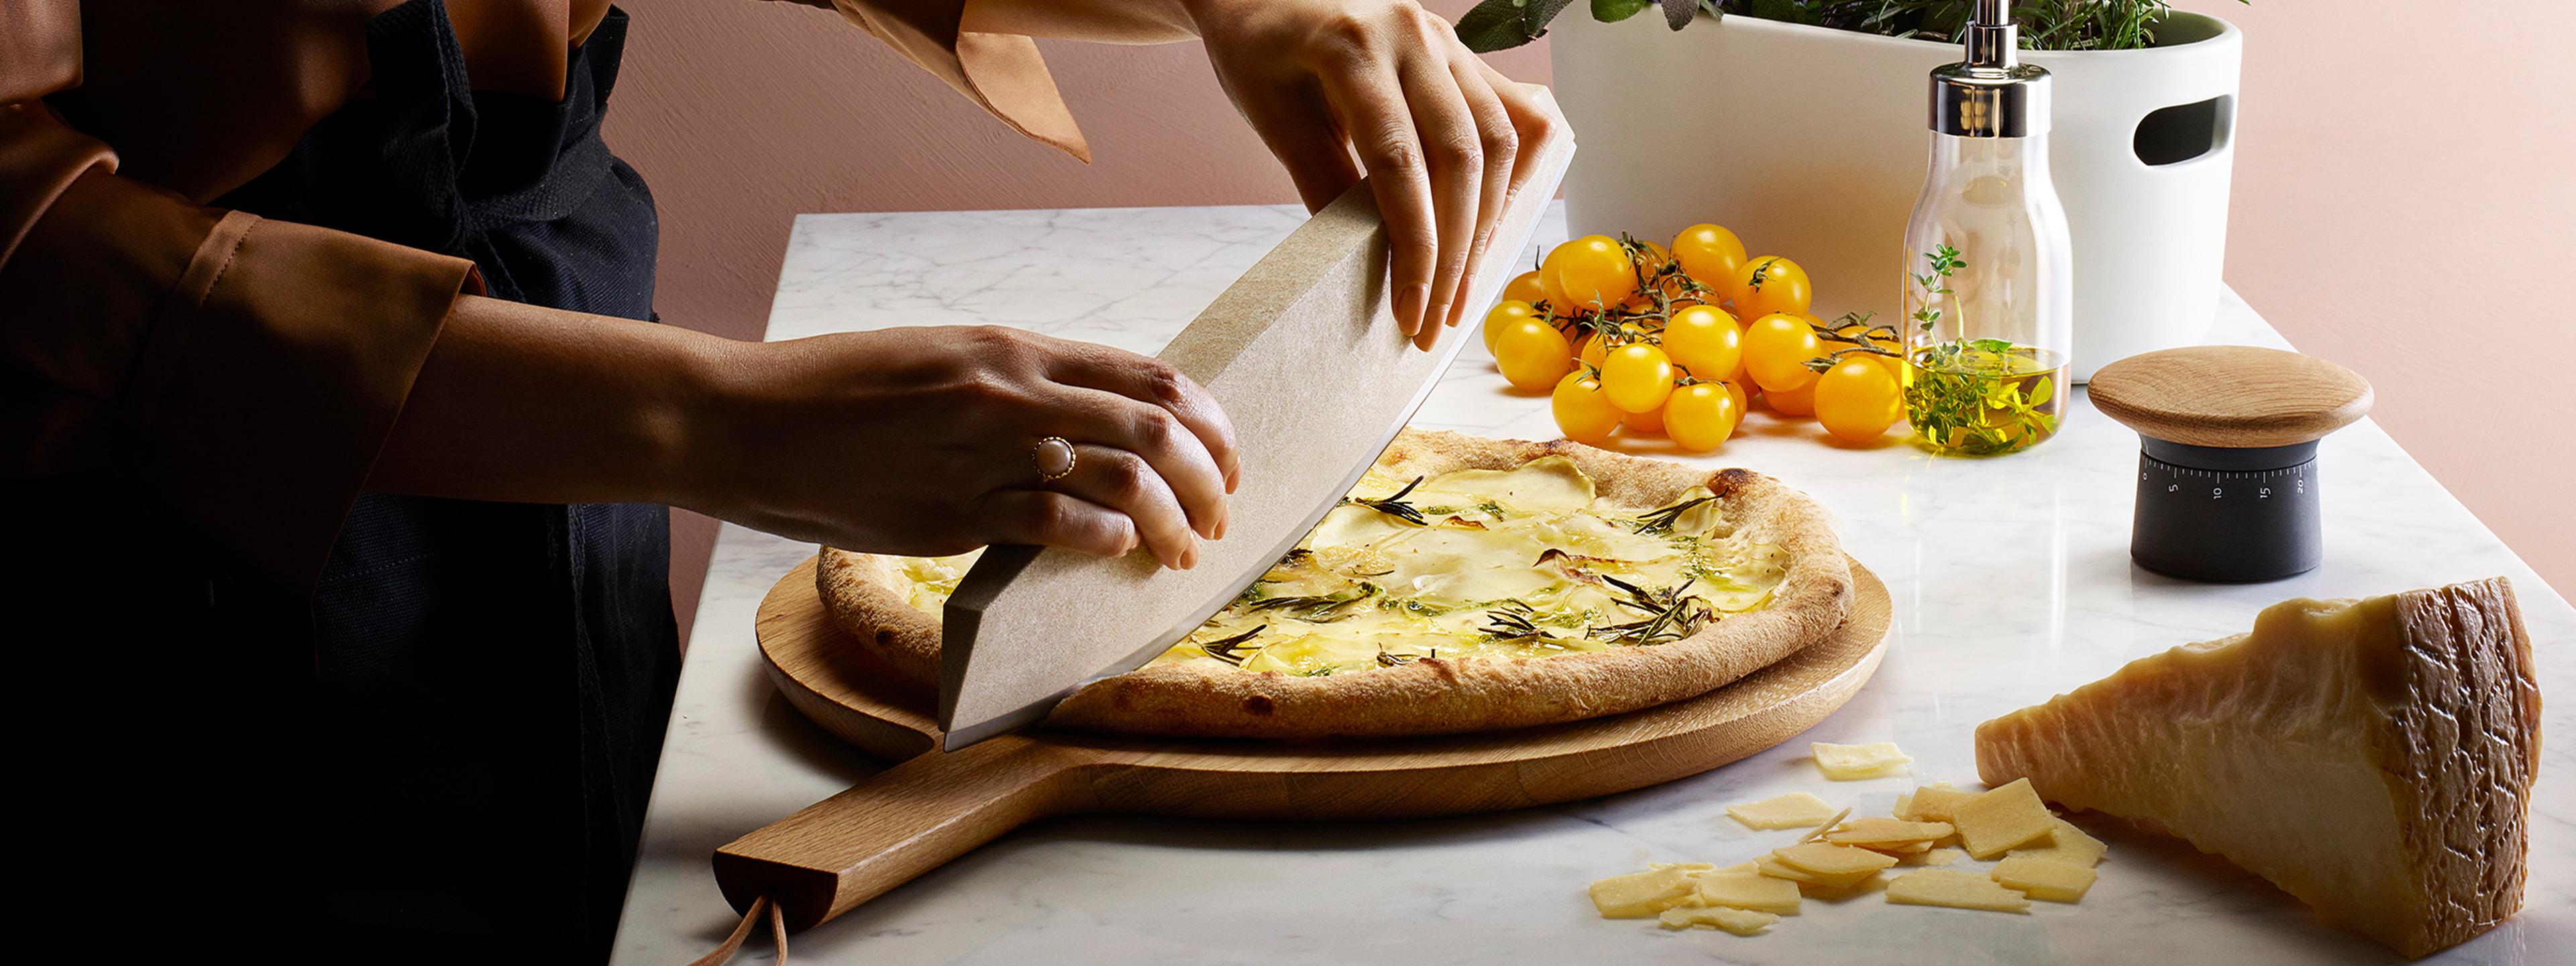 /Ø 27 cm Home of Cake Tortenplatte mit Fu/ß Puro medium in Rosa Matt